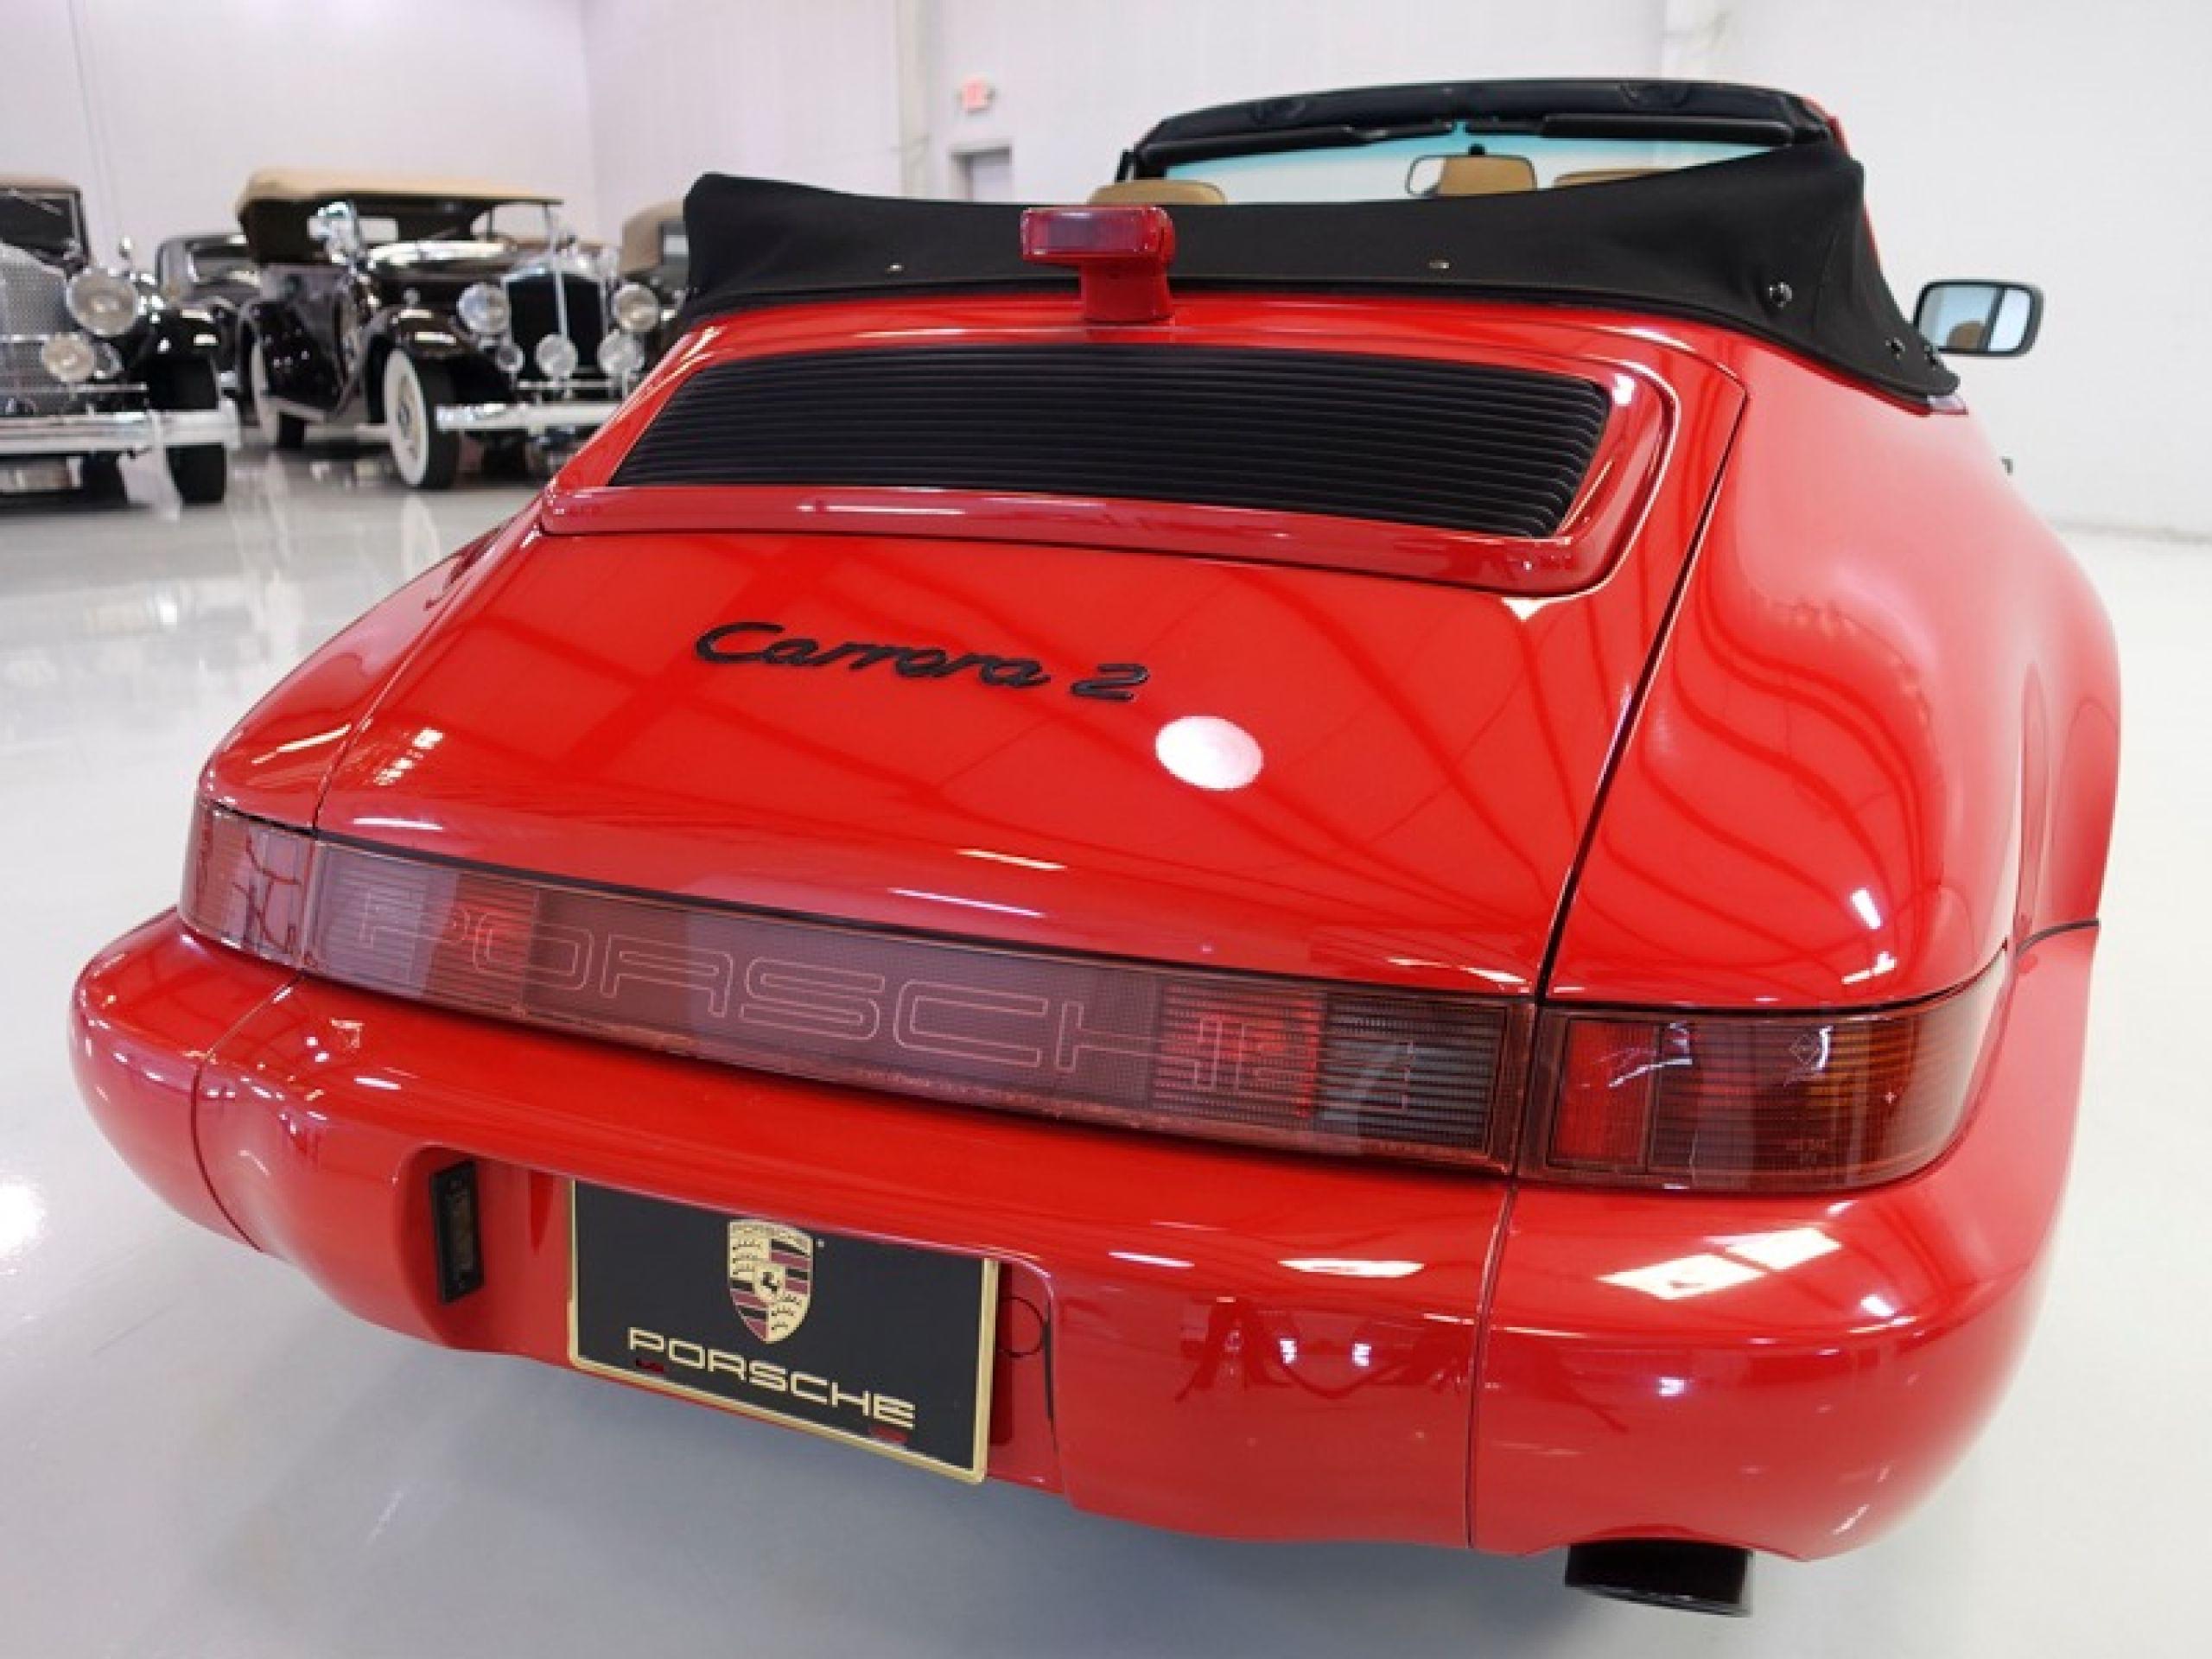 1990 Porsche 911 Carrera 2 Cabriolet